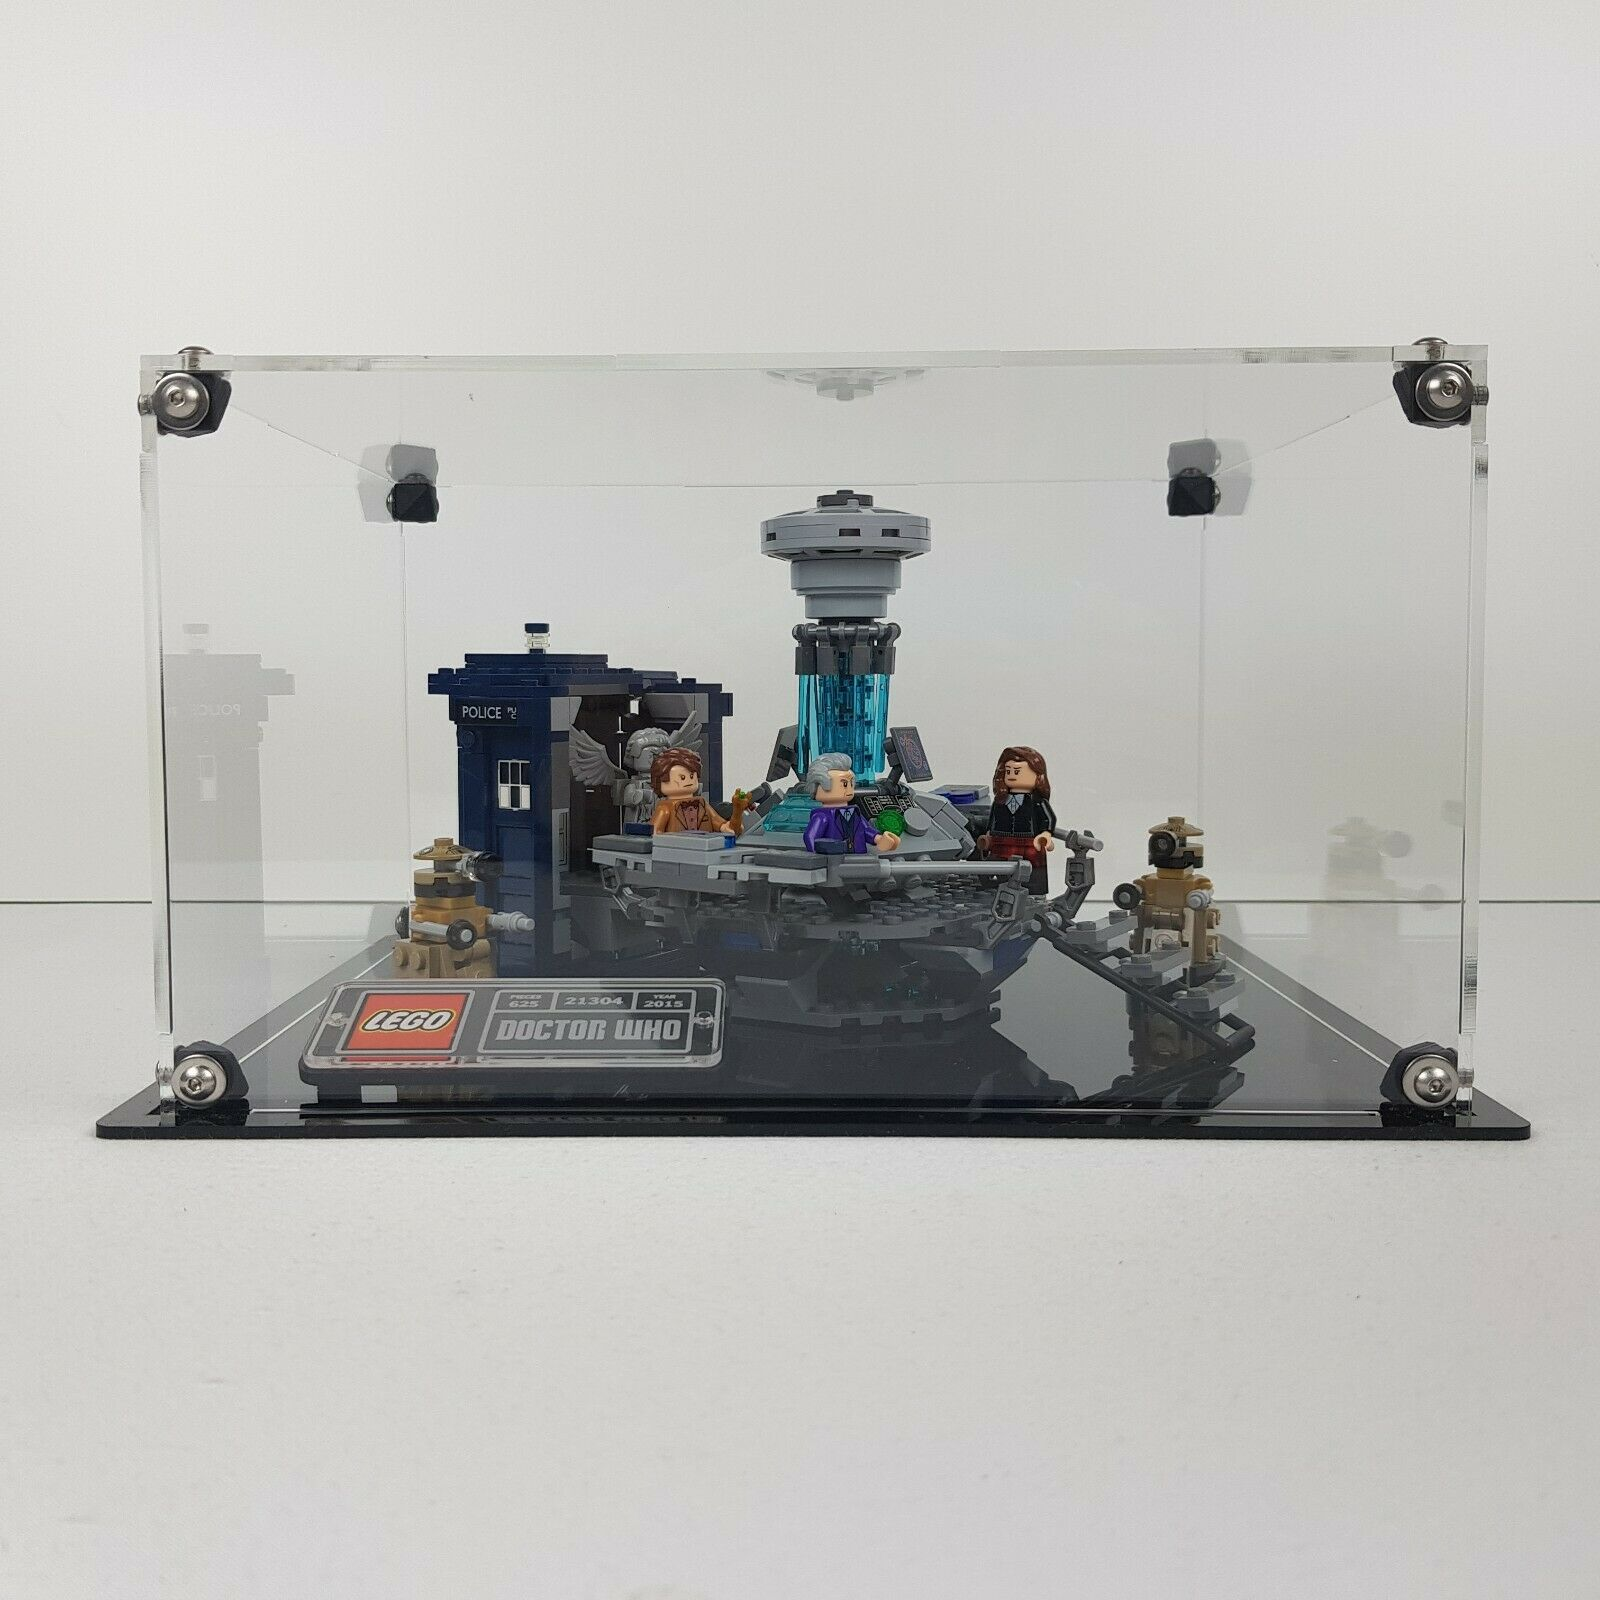 Teca Display LEGO 21304 Doctor Who